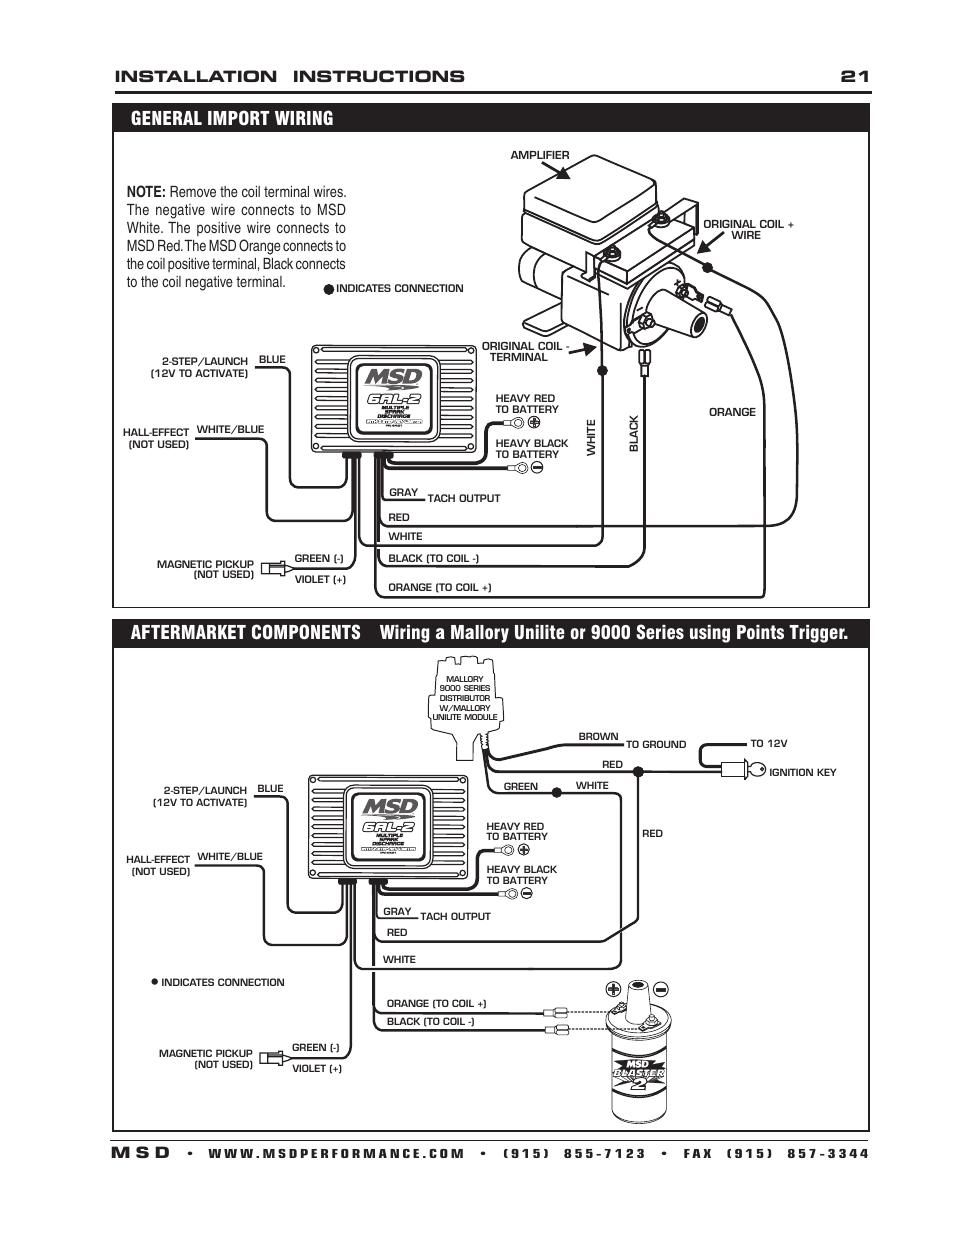 msd wiring diagrams 6al wiring diagram msd wiring diagrams 6al diagram mallory p 9000 mallery ignition  sc 1 st  Wiring Diagrams : msd wiring - yogabreezes.com